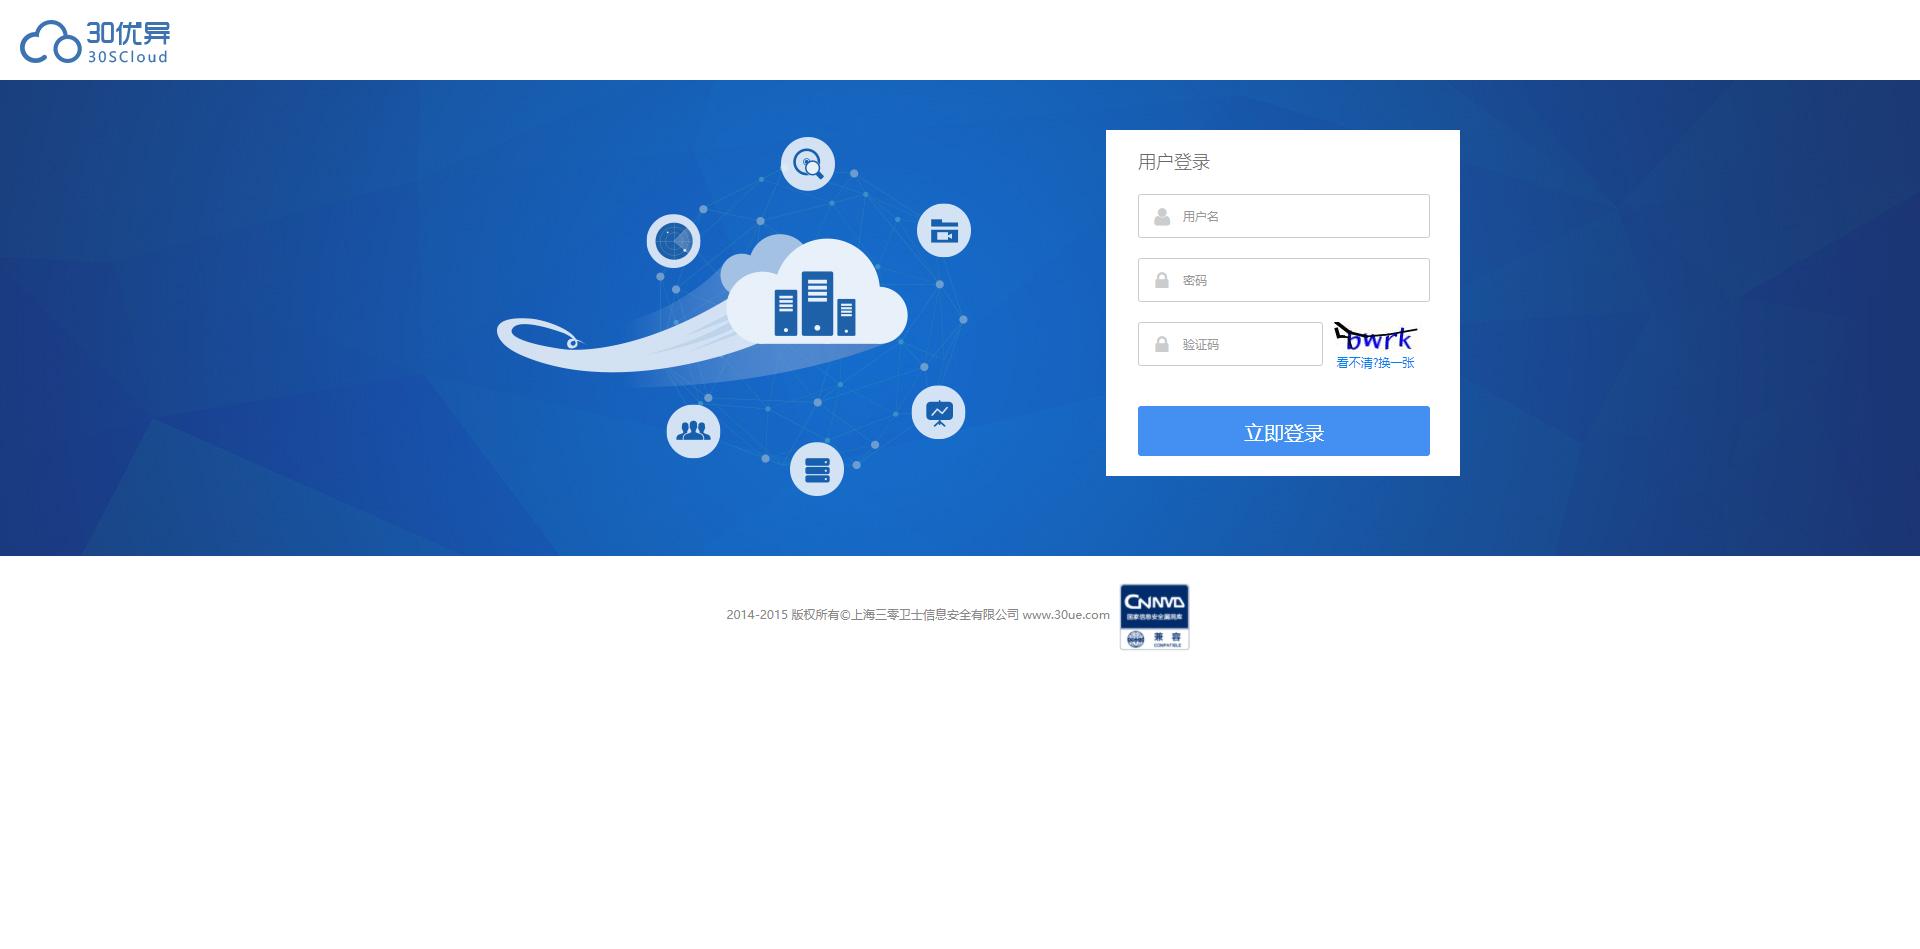 web登录_web浏览器